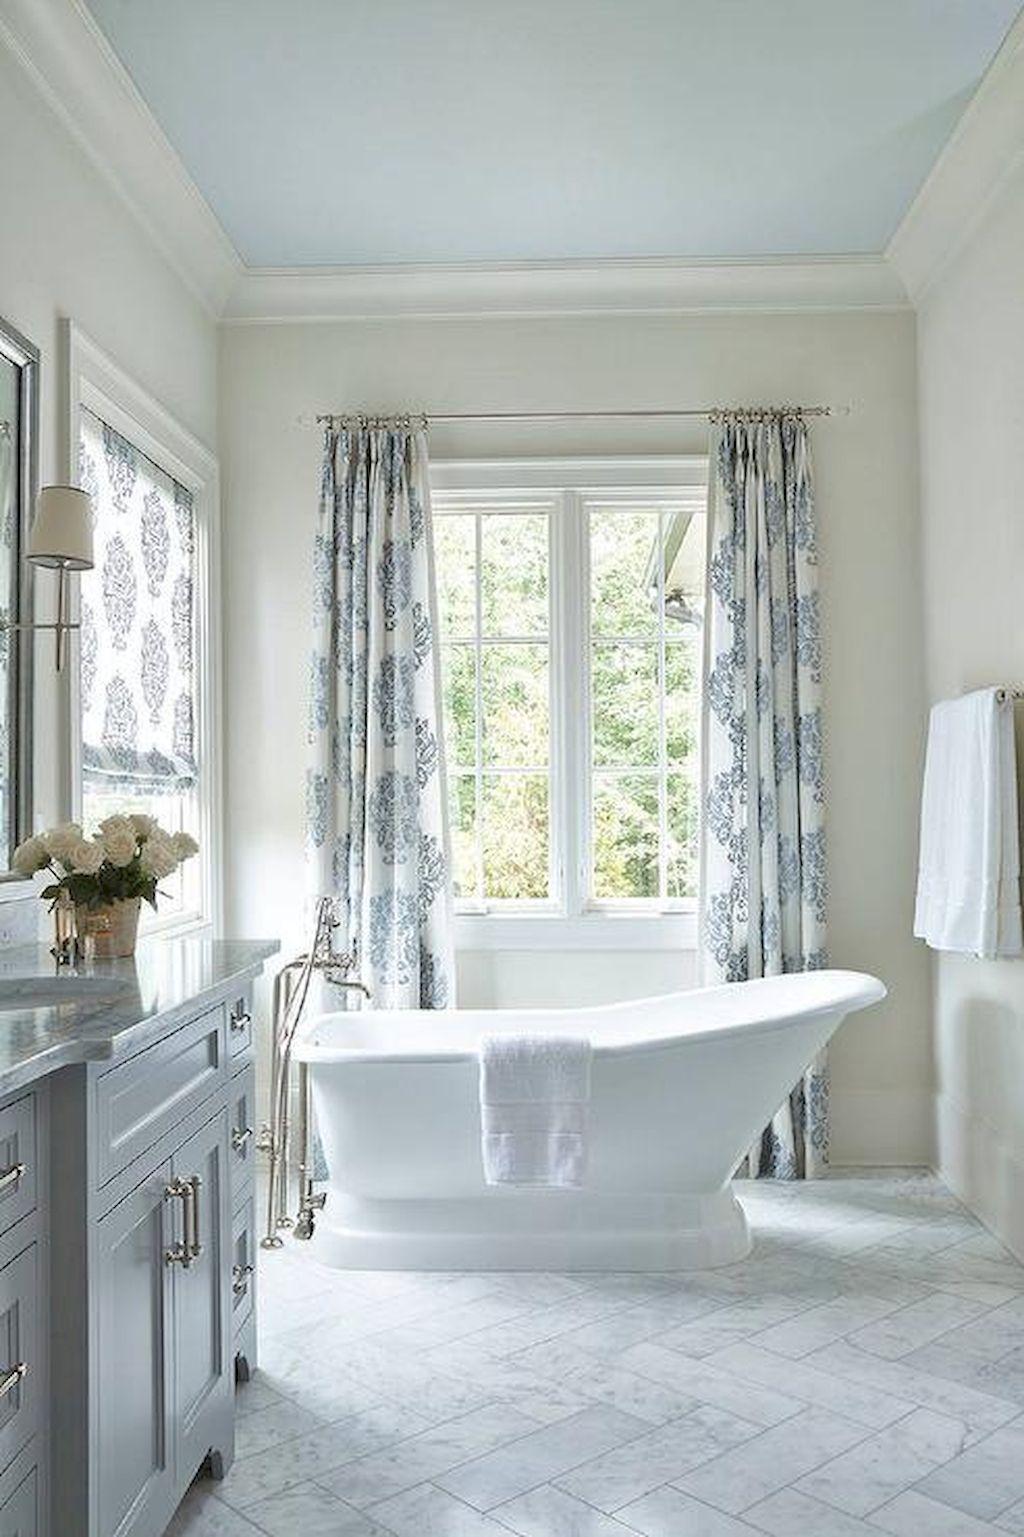 85 Coastal Style Bathroom Designs Ideas | Master bathrooms, Bathroom ...